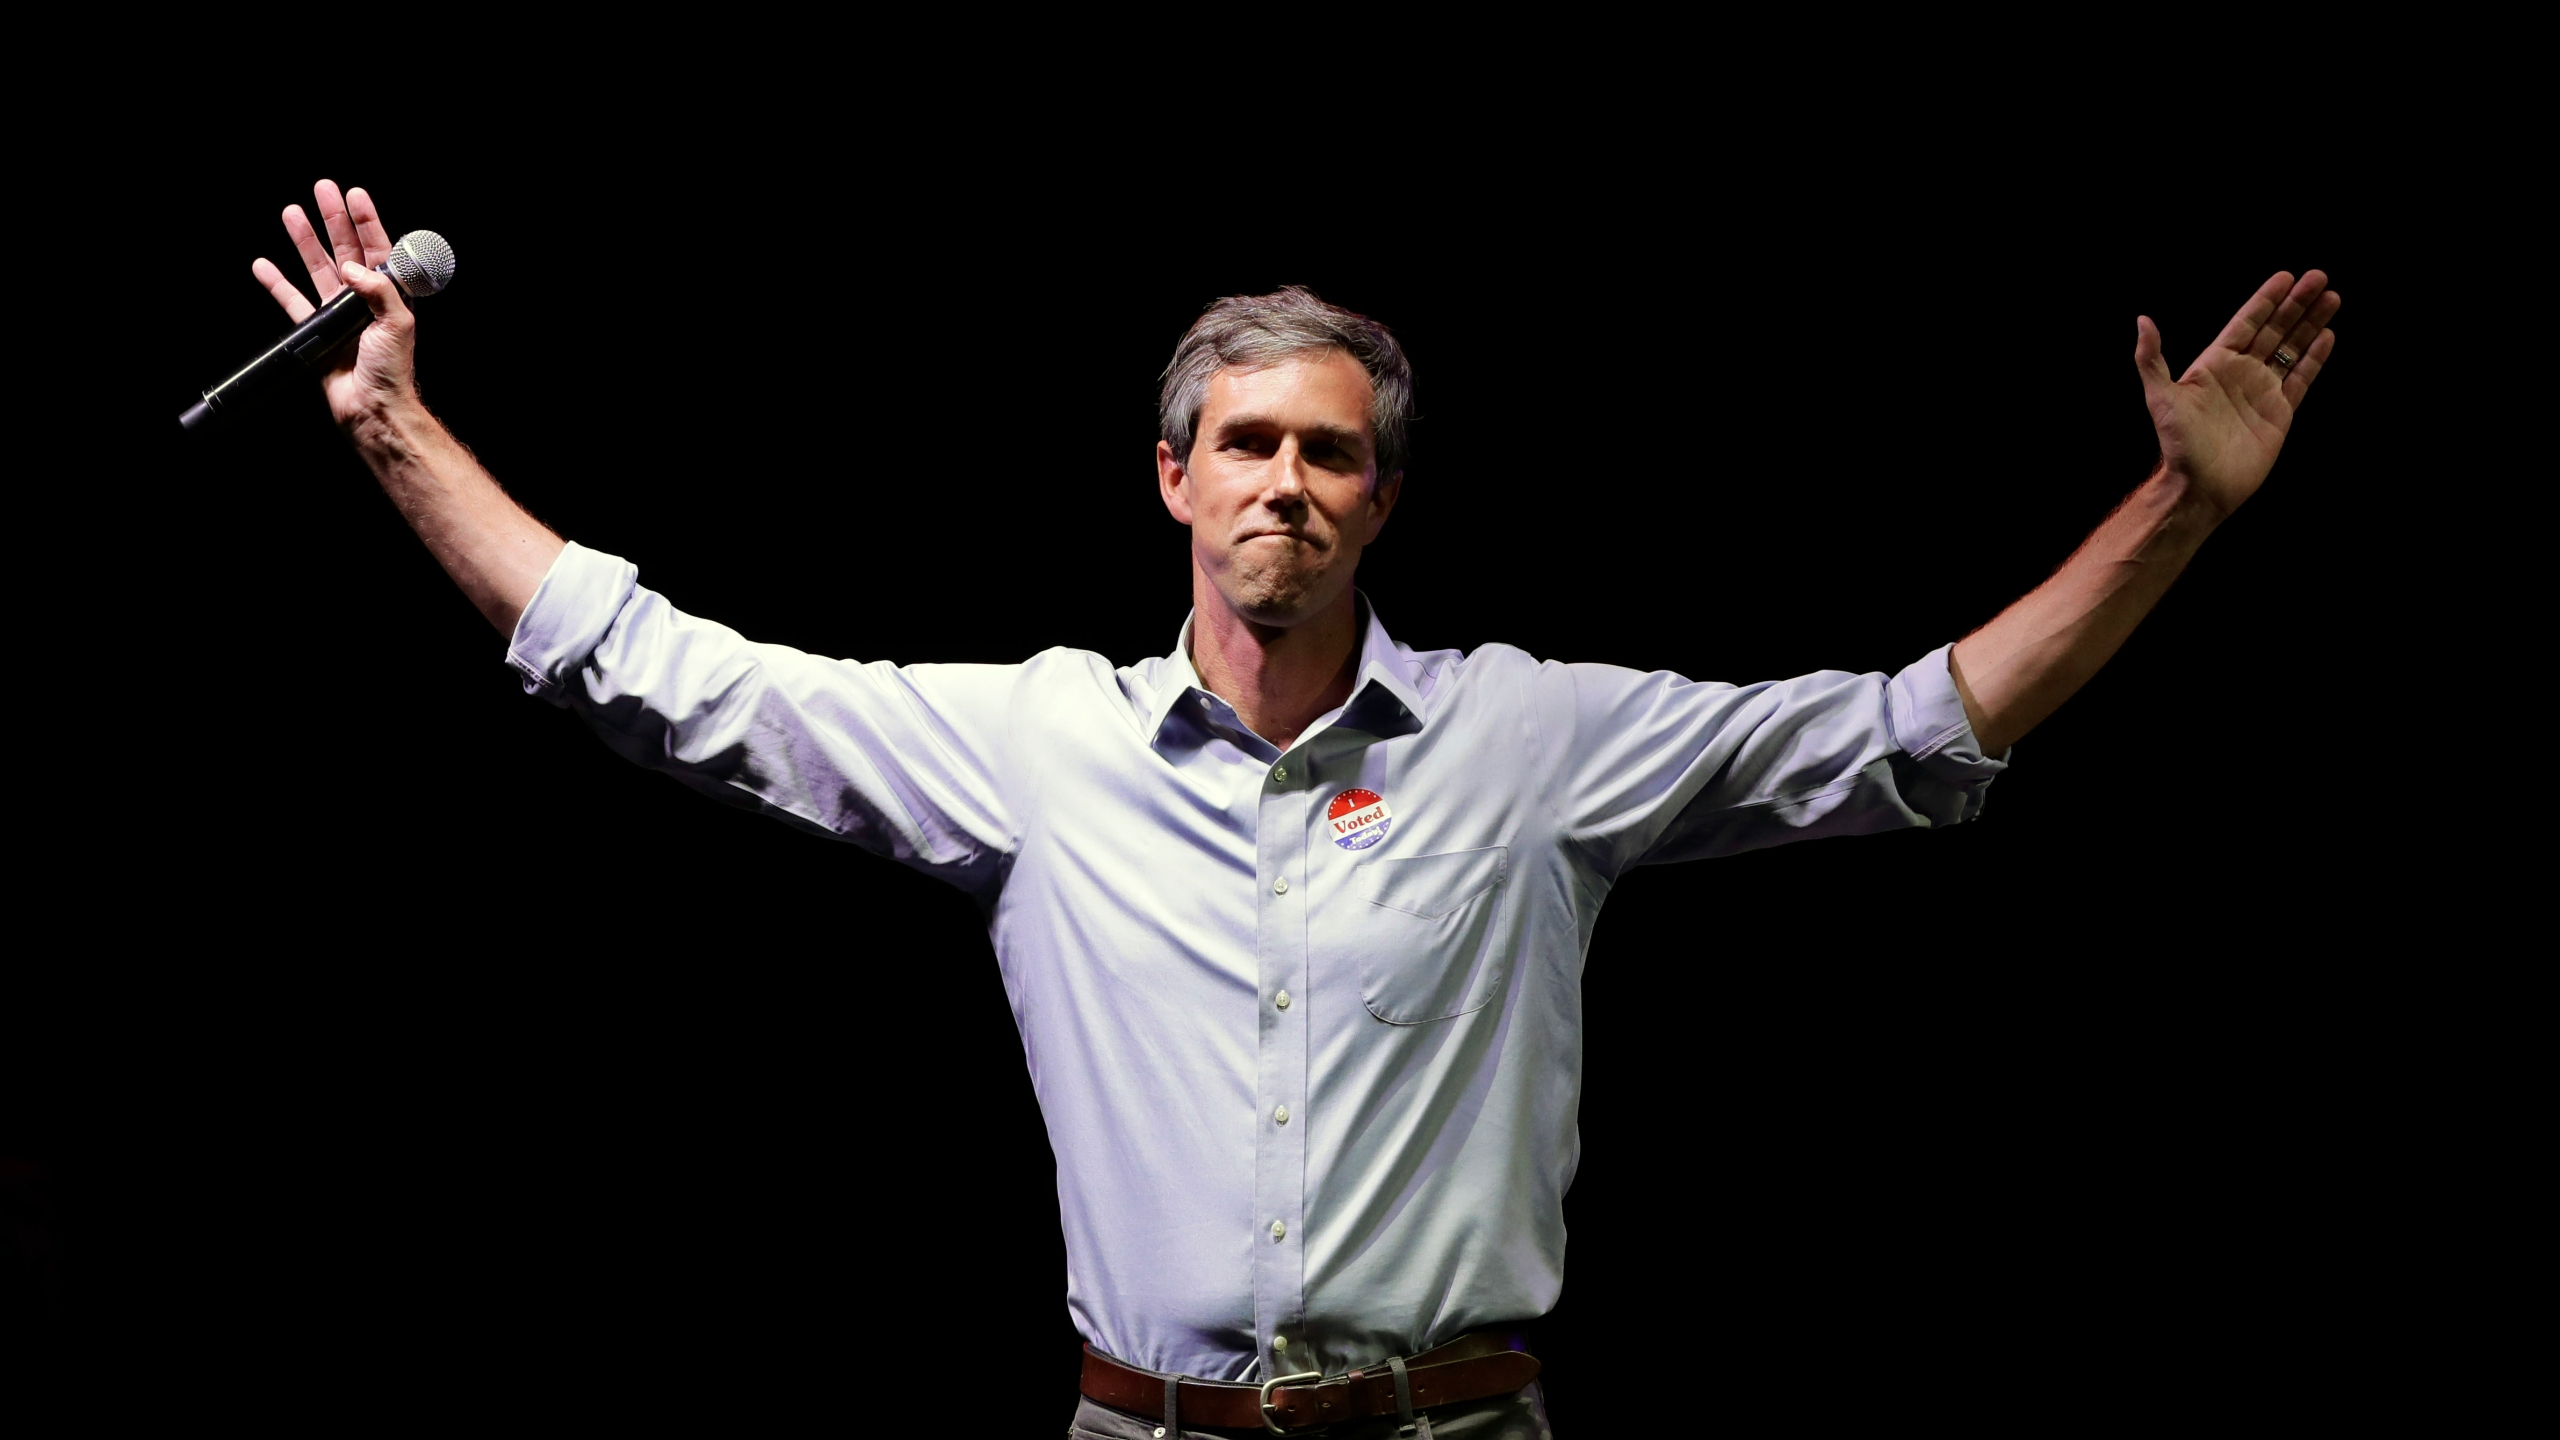 Election_2020_Beto_O'Rourke_60529-159532.jpg23559423